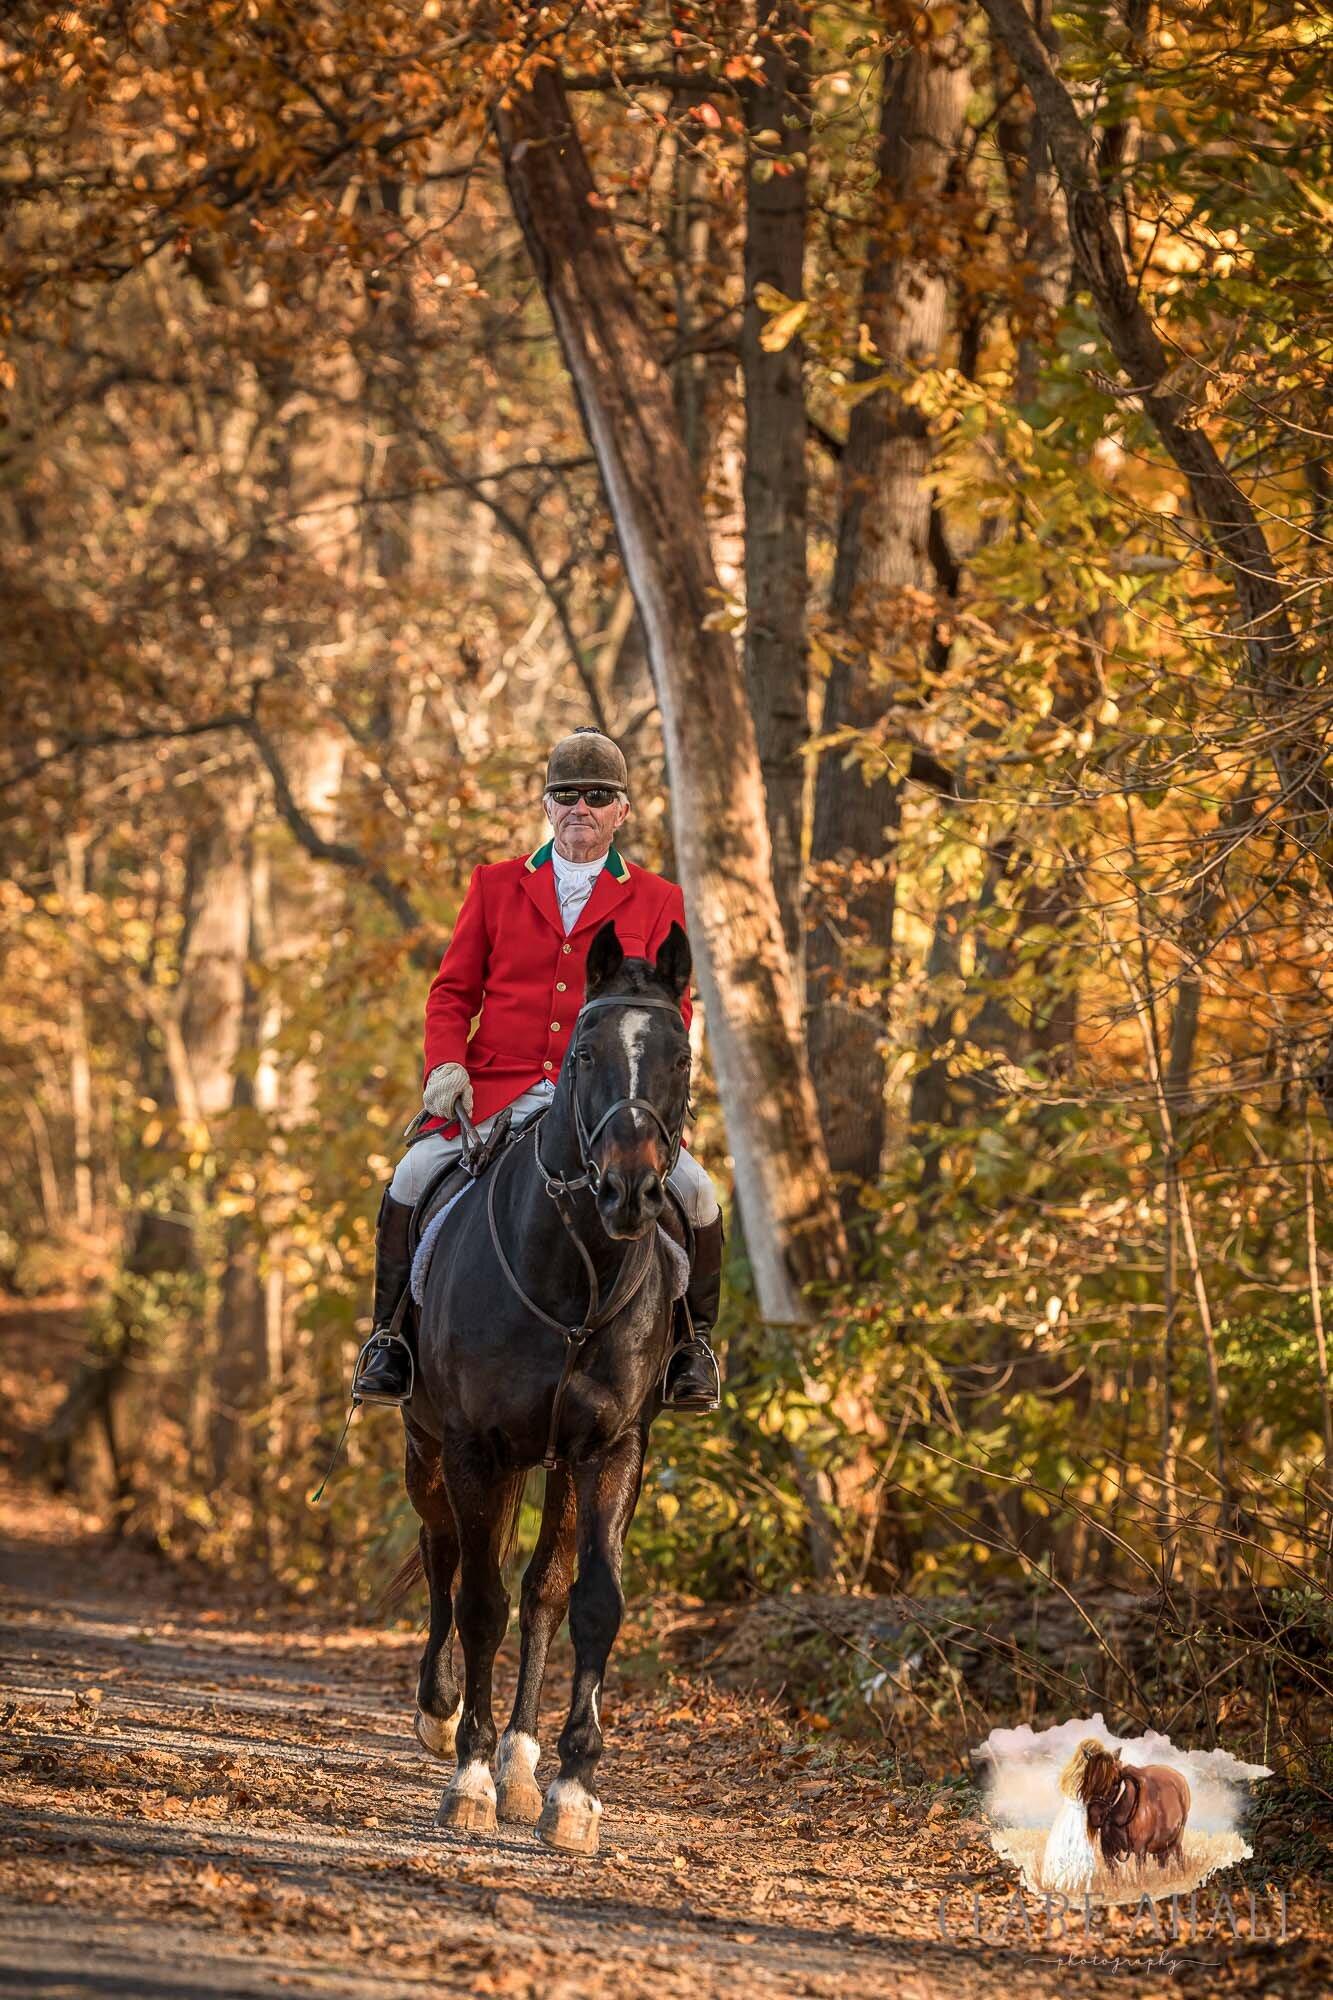 equine_photographer_potomac_md_equine_photographer_middleburg_VA_equine_portraiture_loudon_county_VA-1273.jpg